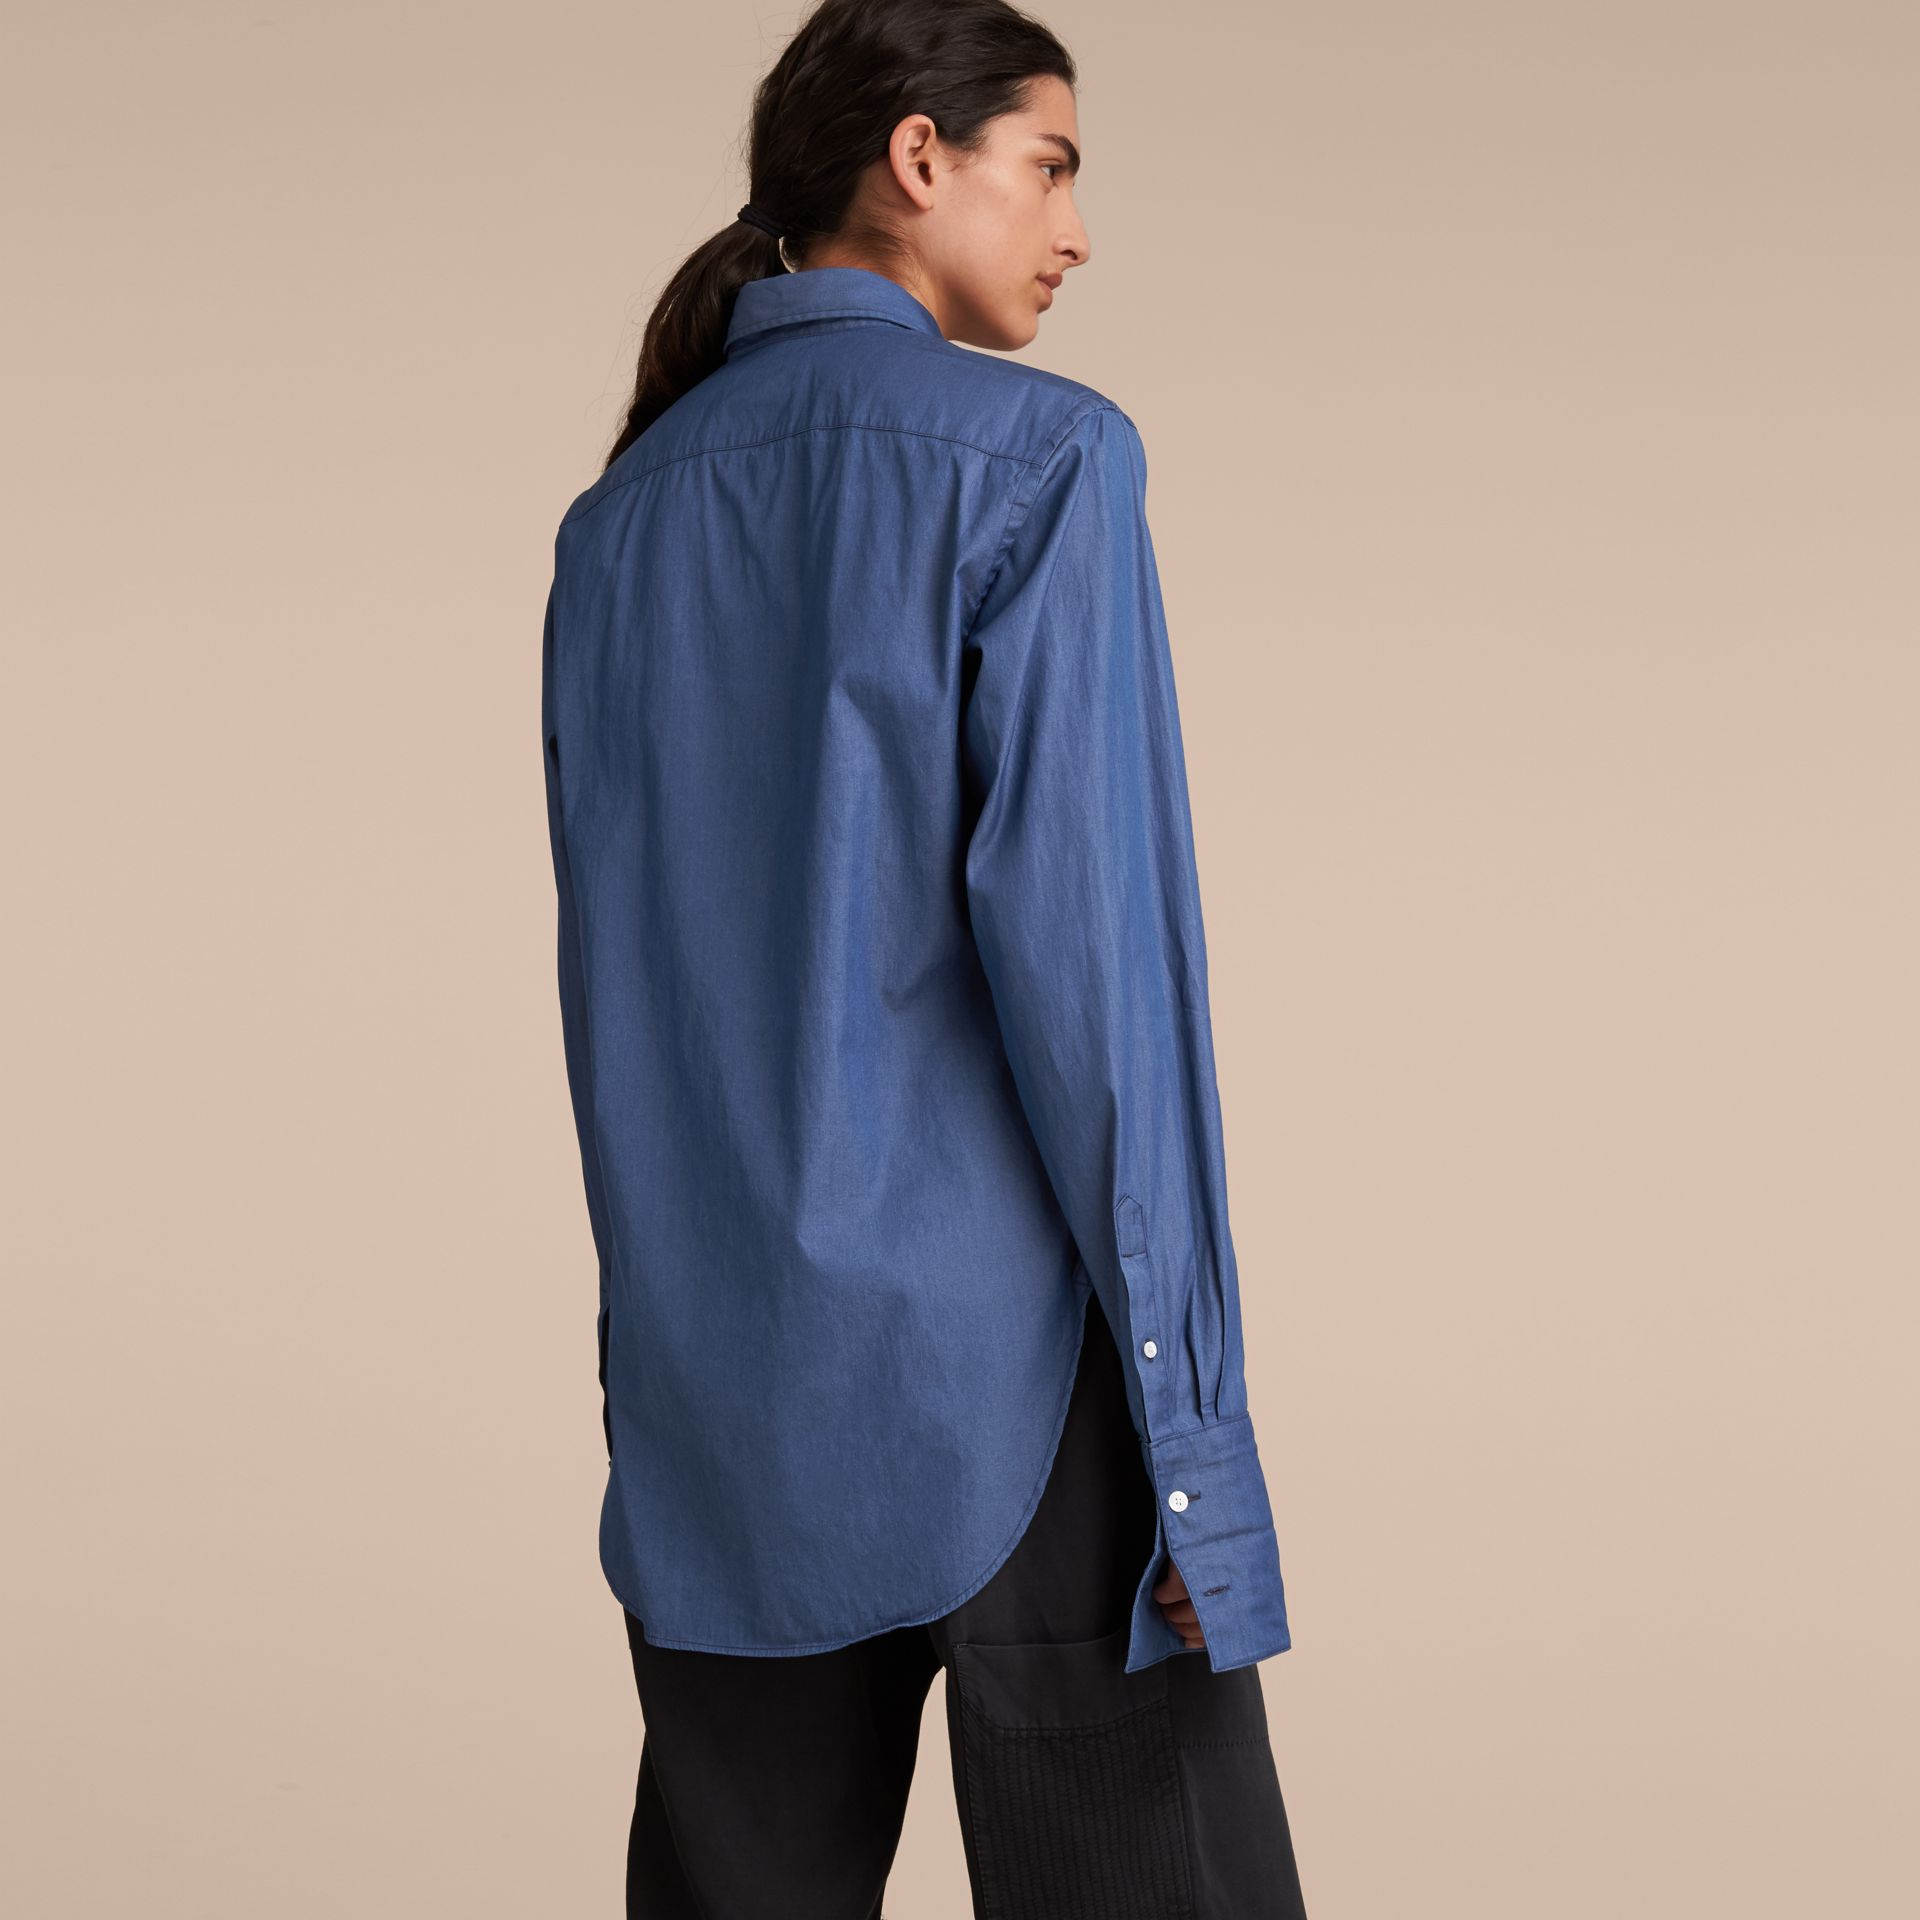 Unisex Double-cuff Pintuck Bib Cotton Shirt Denim Blue - gallery image 3